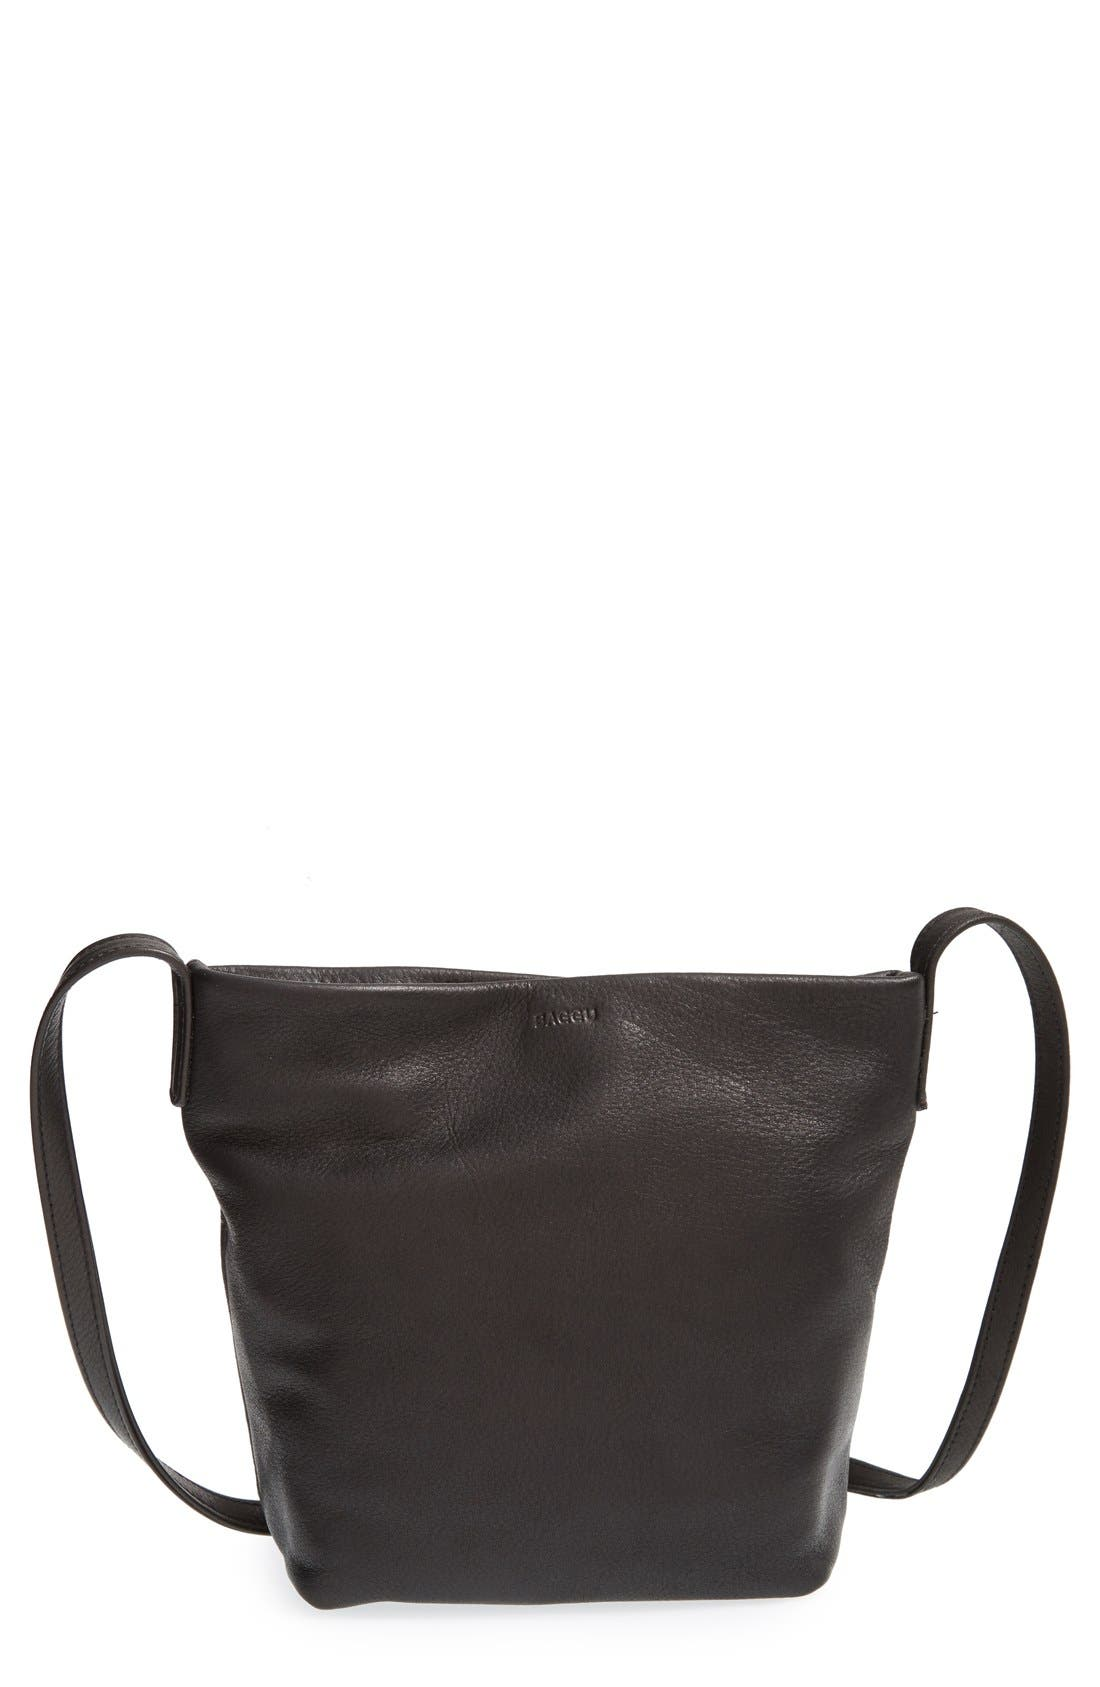 BAGGU,                              Leather Crossbody Bag,                             Main thumbnail 1, color,                             004